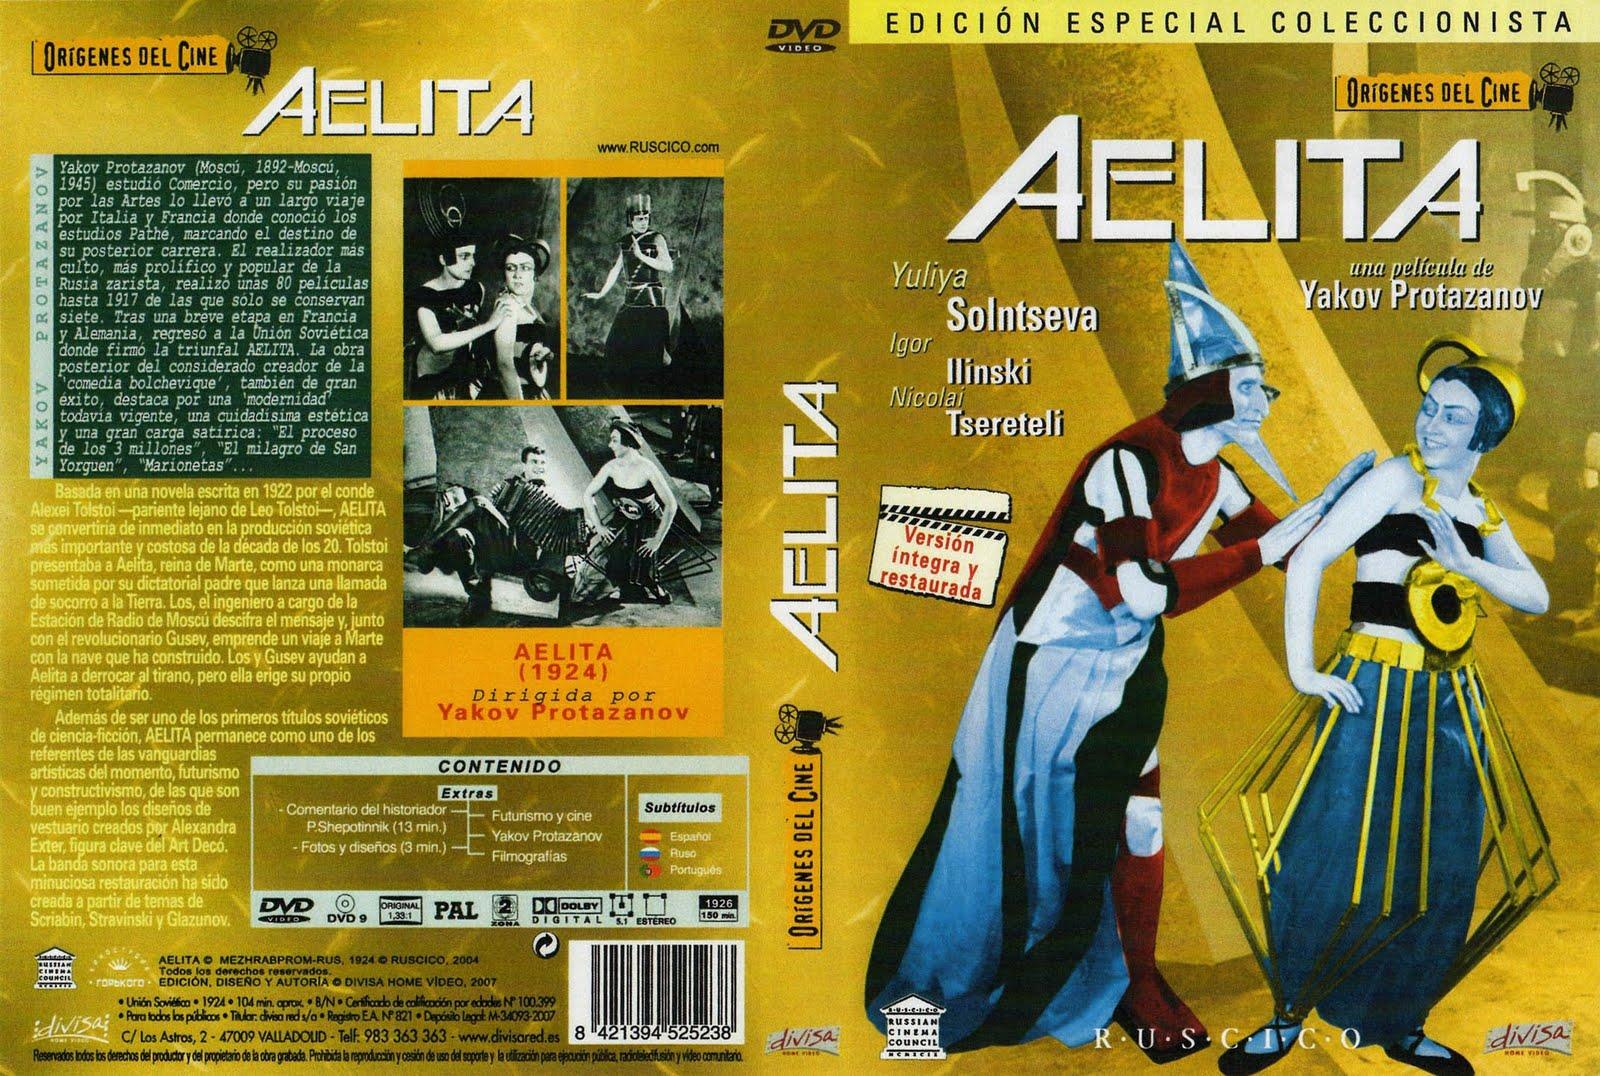 Aelita 1924 ( Cine Mudo + Subs ) DescargaCineClasico.Net